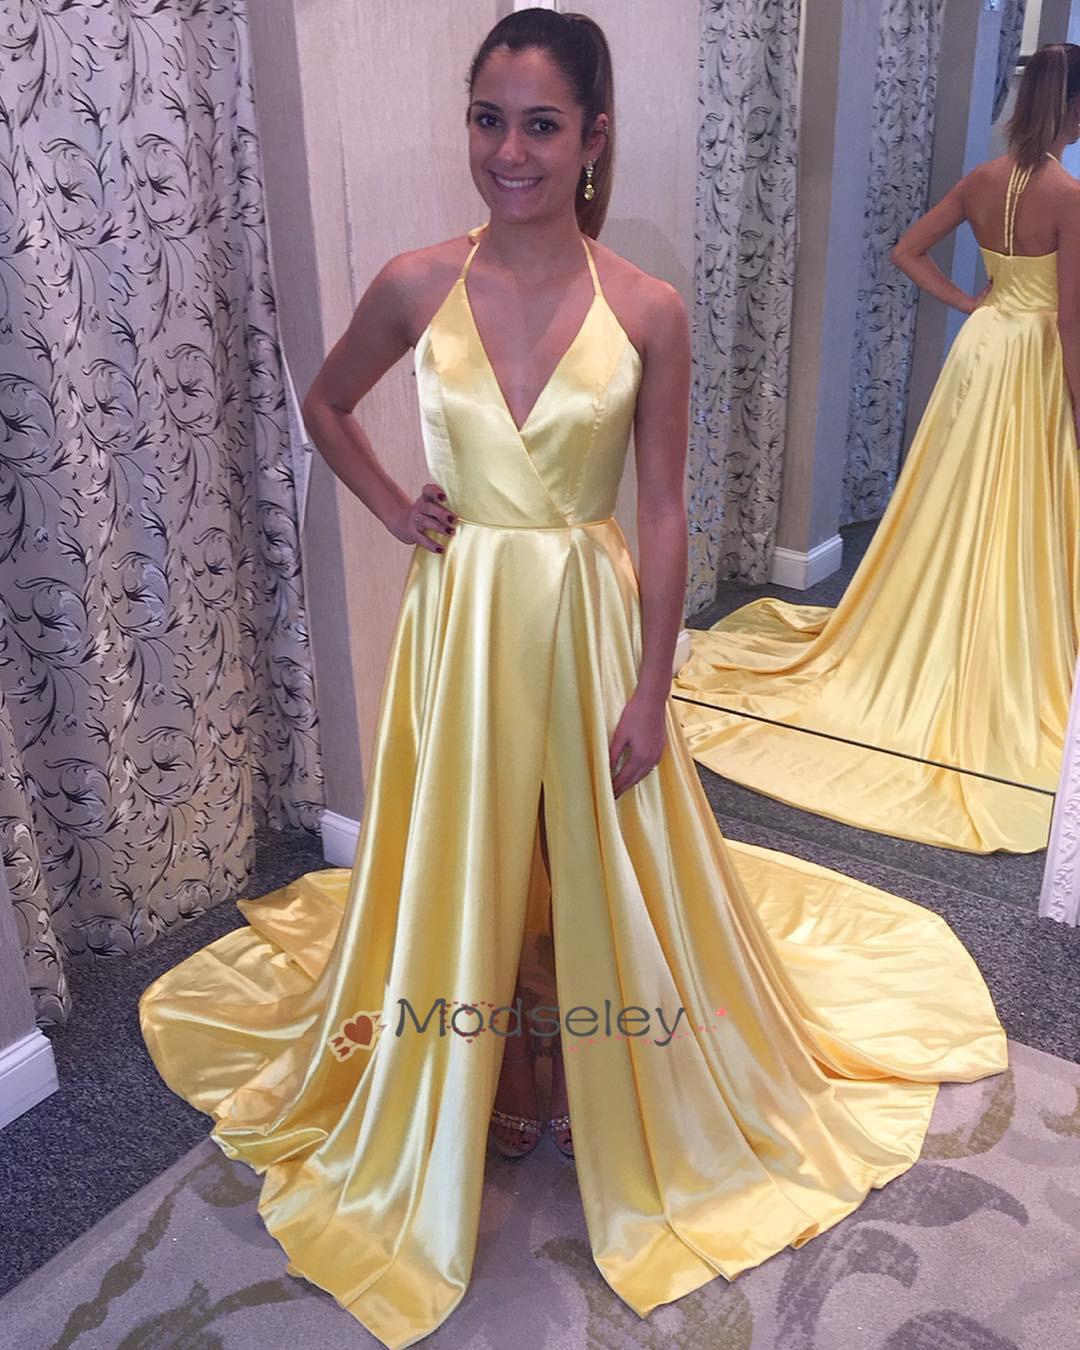 387cd33645e Halter Yellow Long Prom Dress (98320665 modseleystore) photo